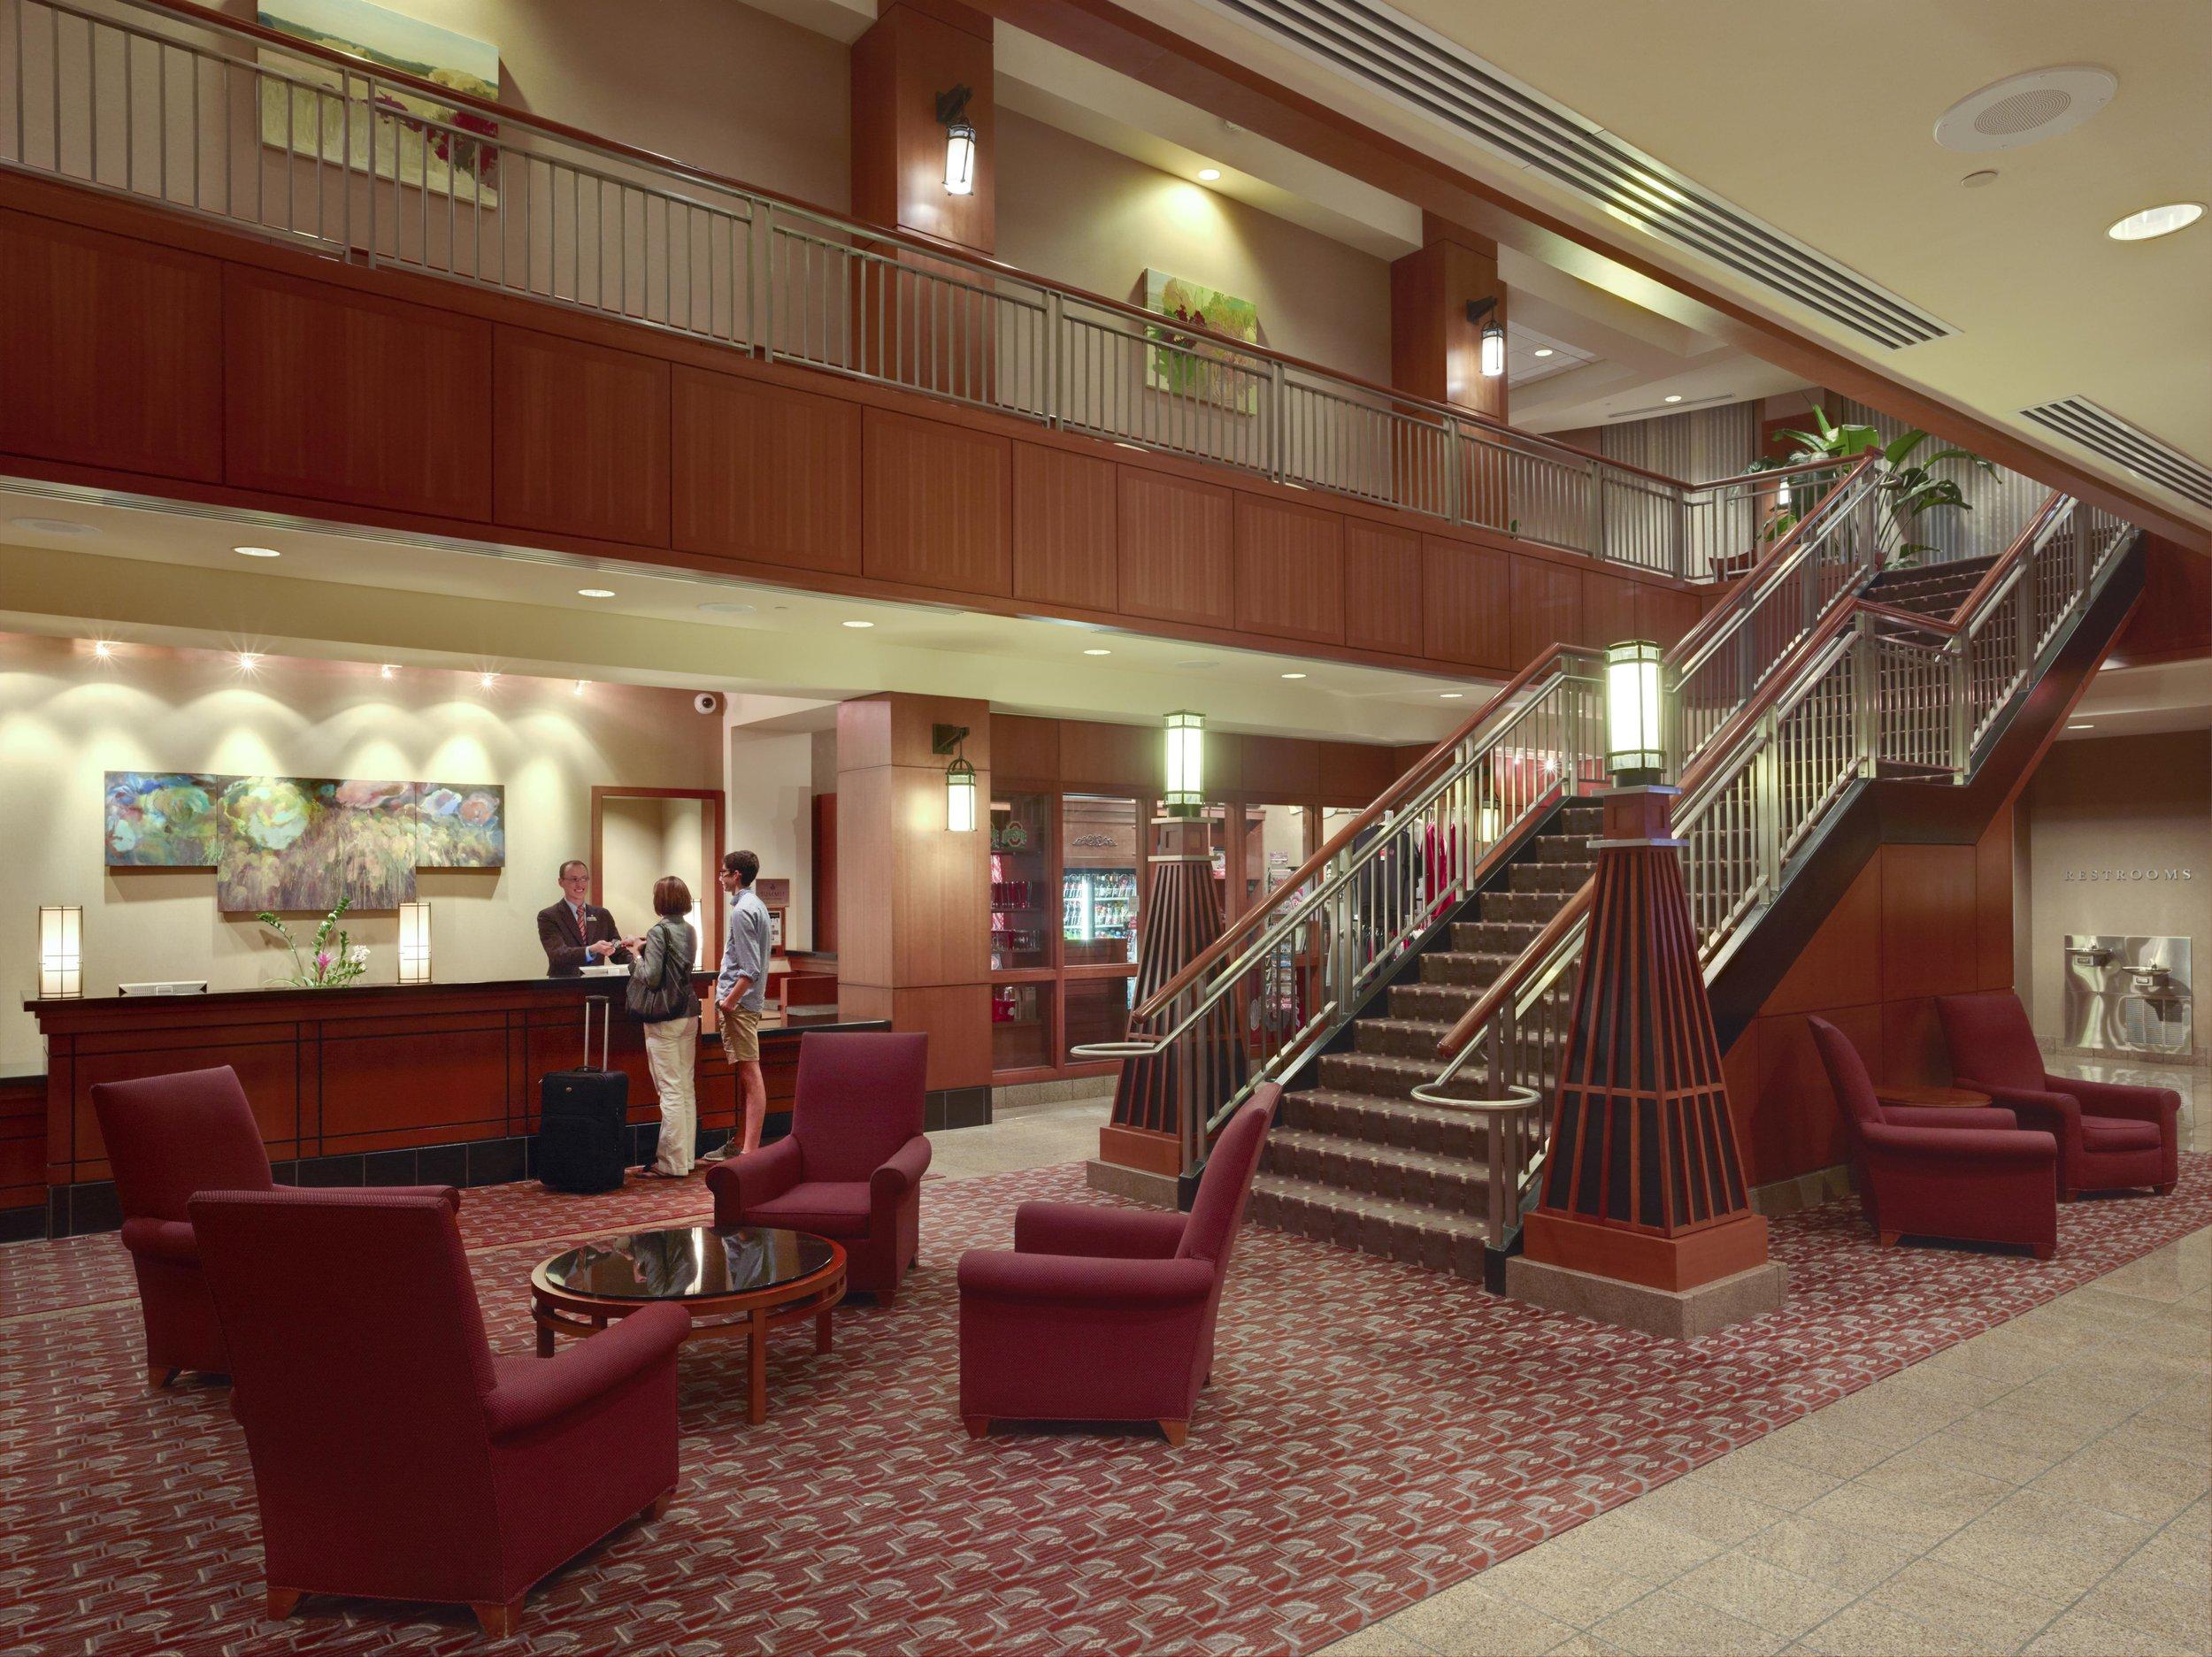 Blackwell Lobby Stairs.JPG